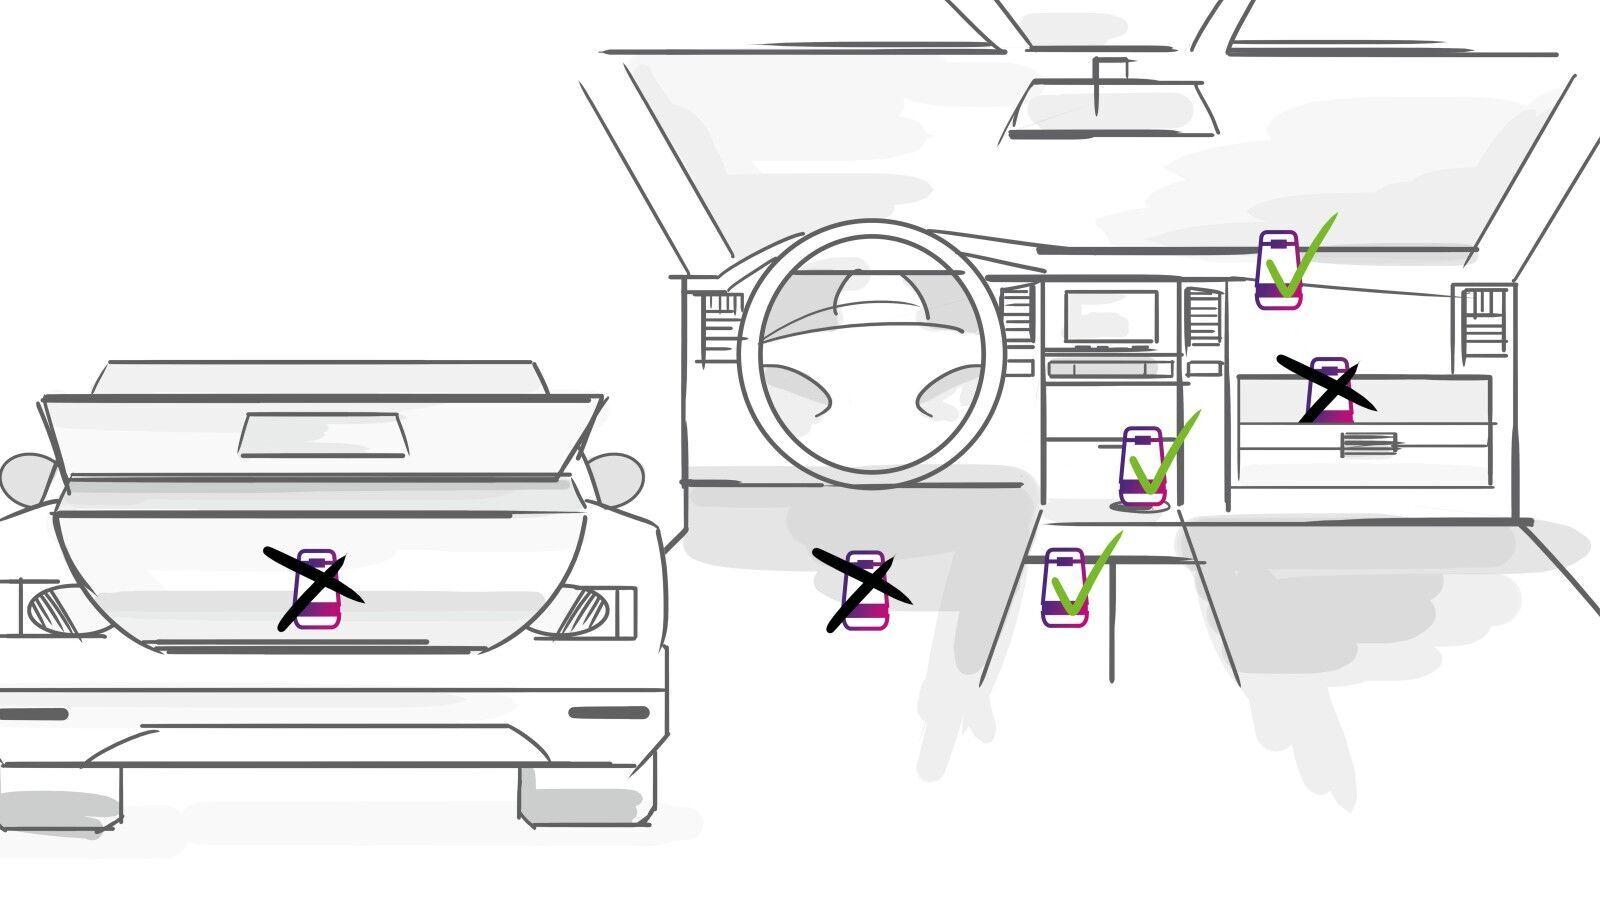 Bosch презентовала сигнализацию Spexor. Фото: